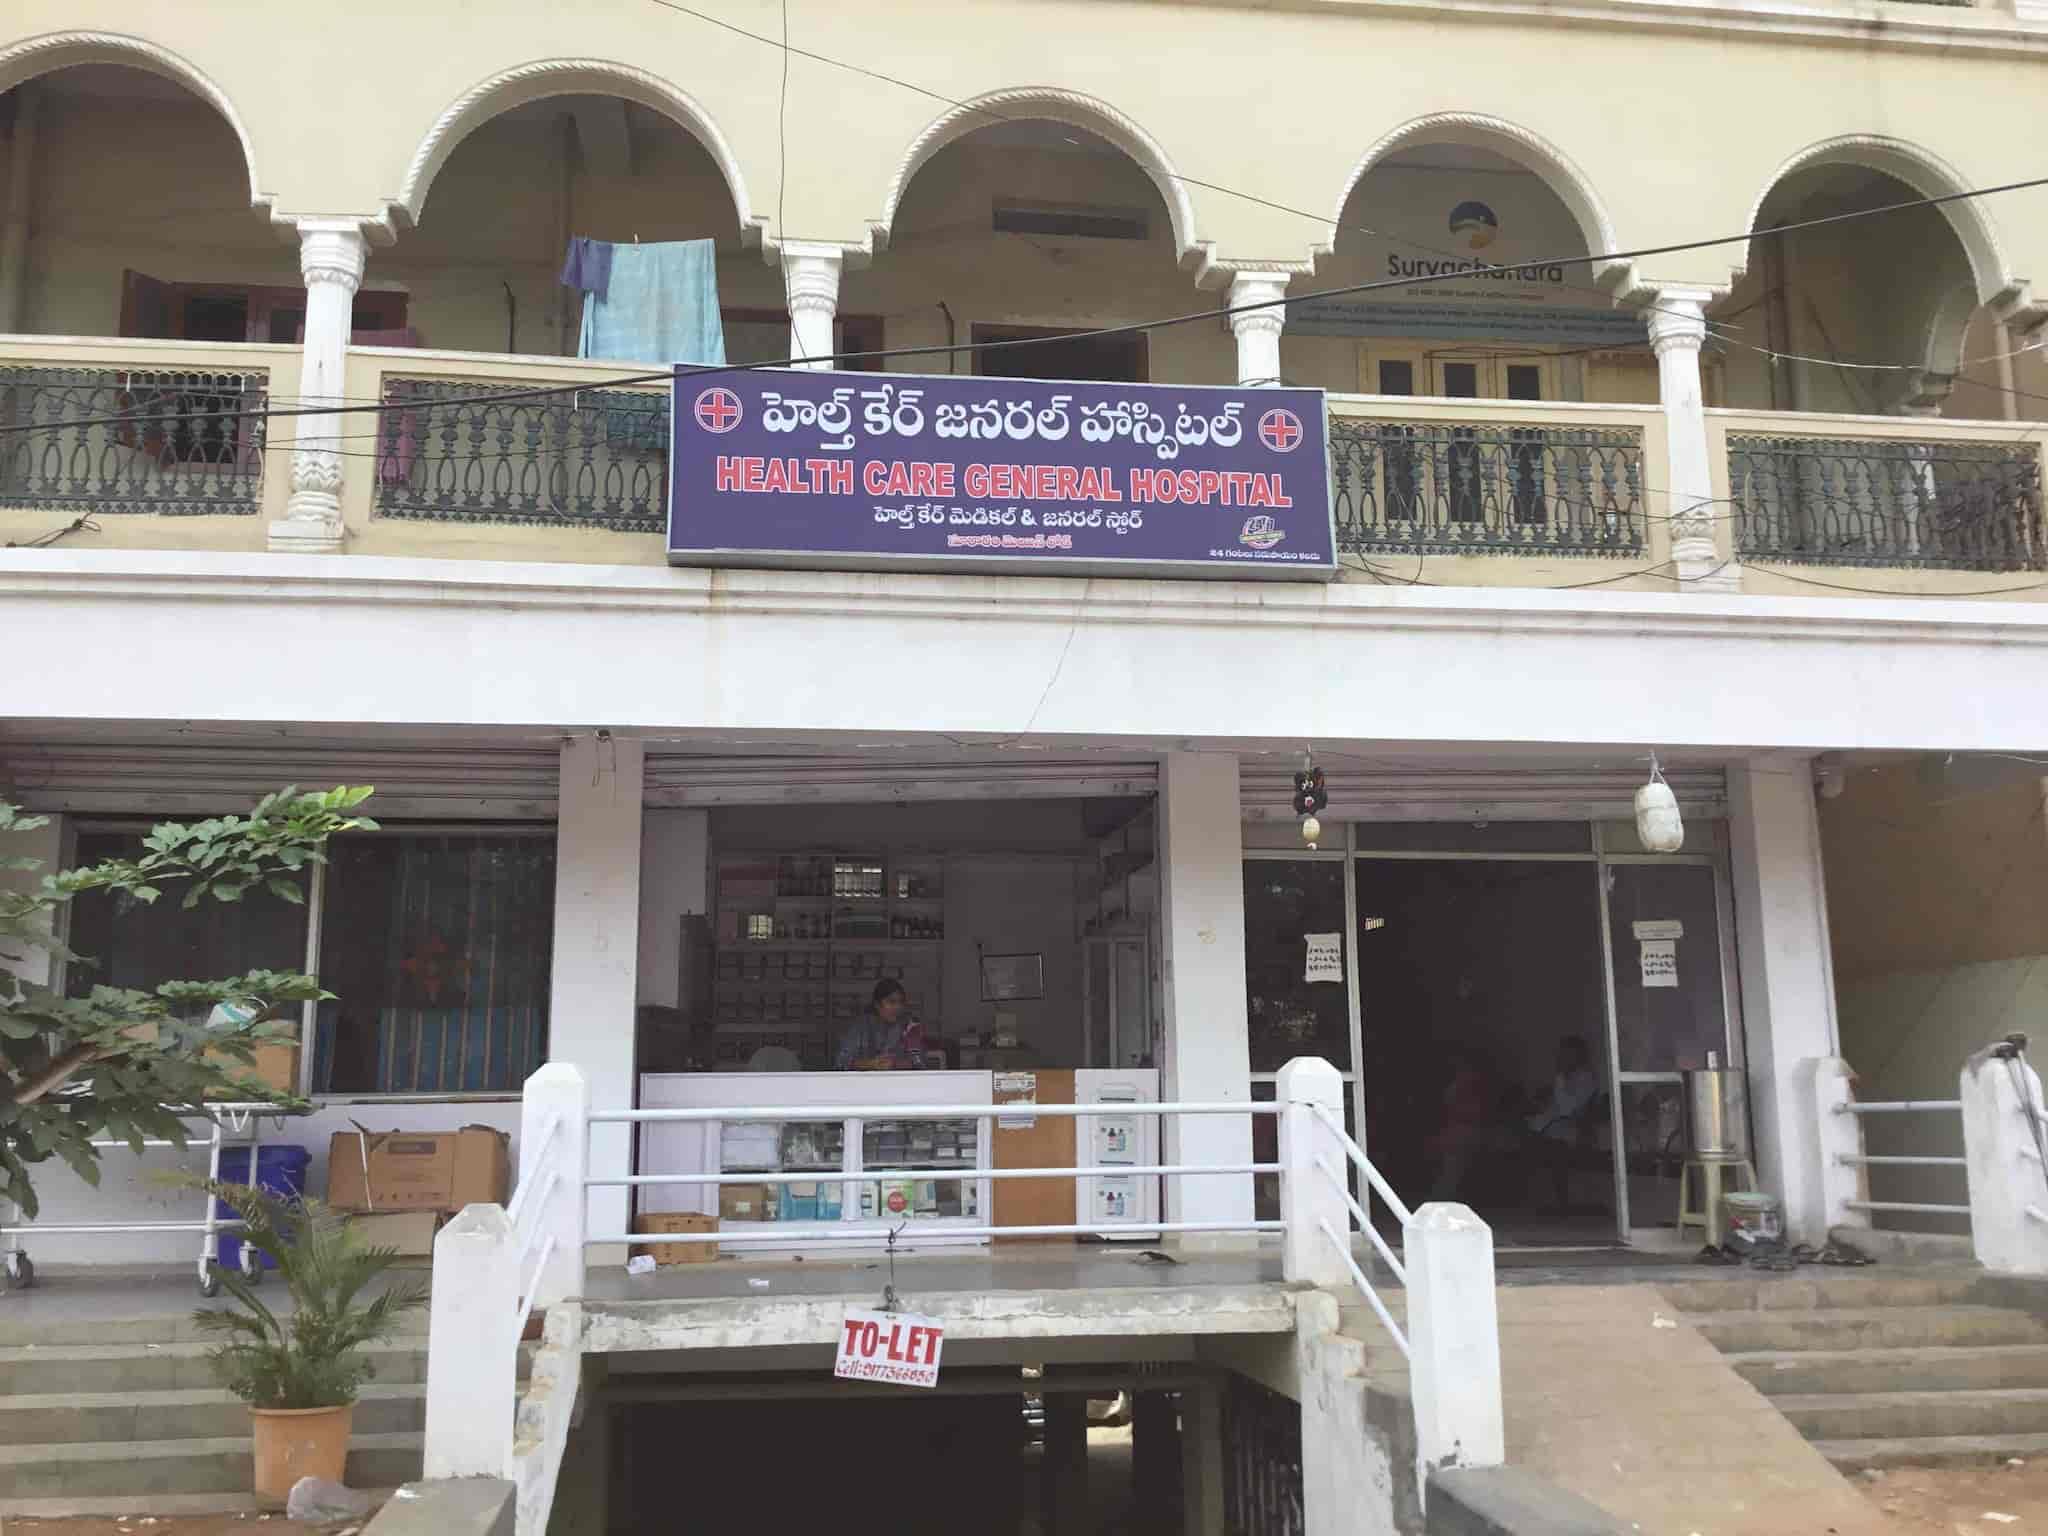 Health Care General Hospital, Suraram - Hospitals in